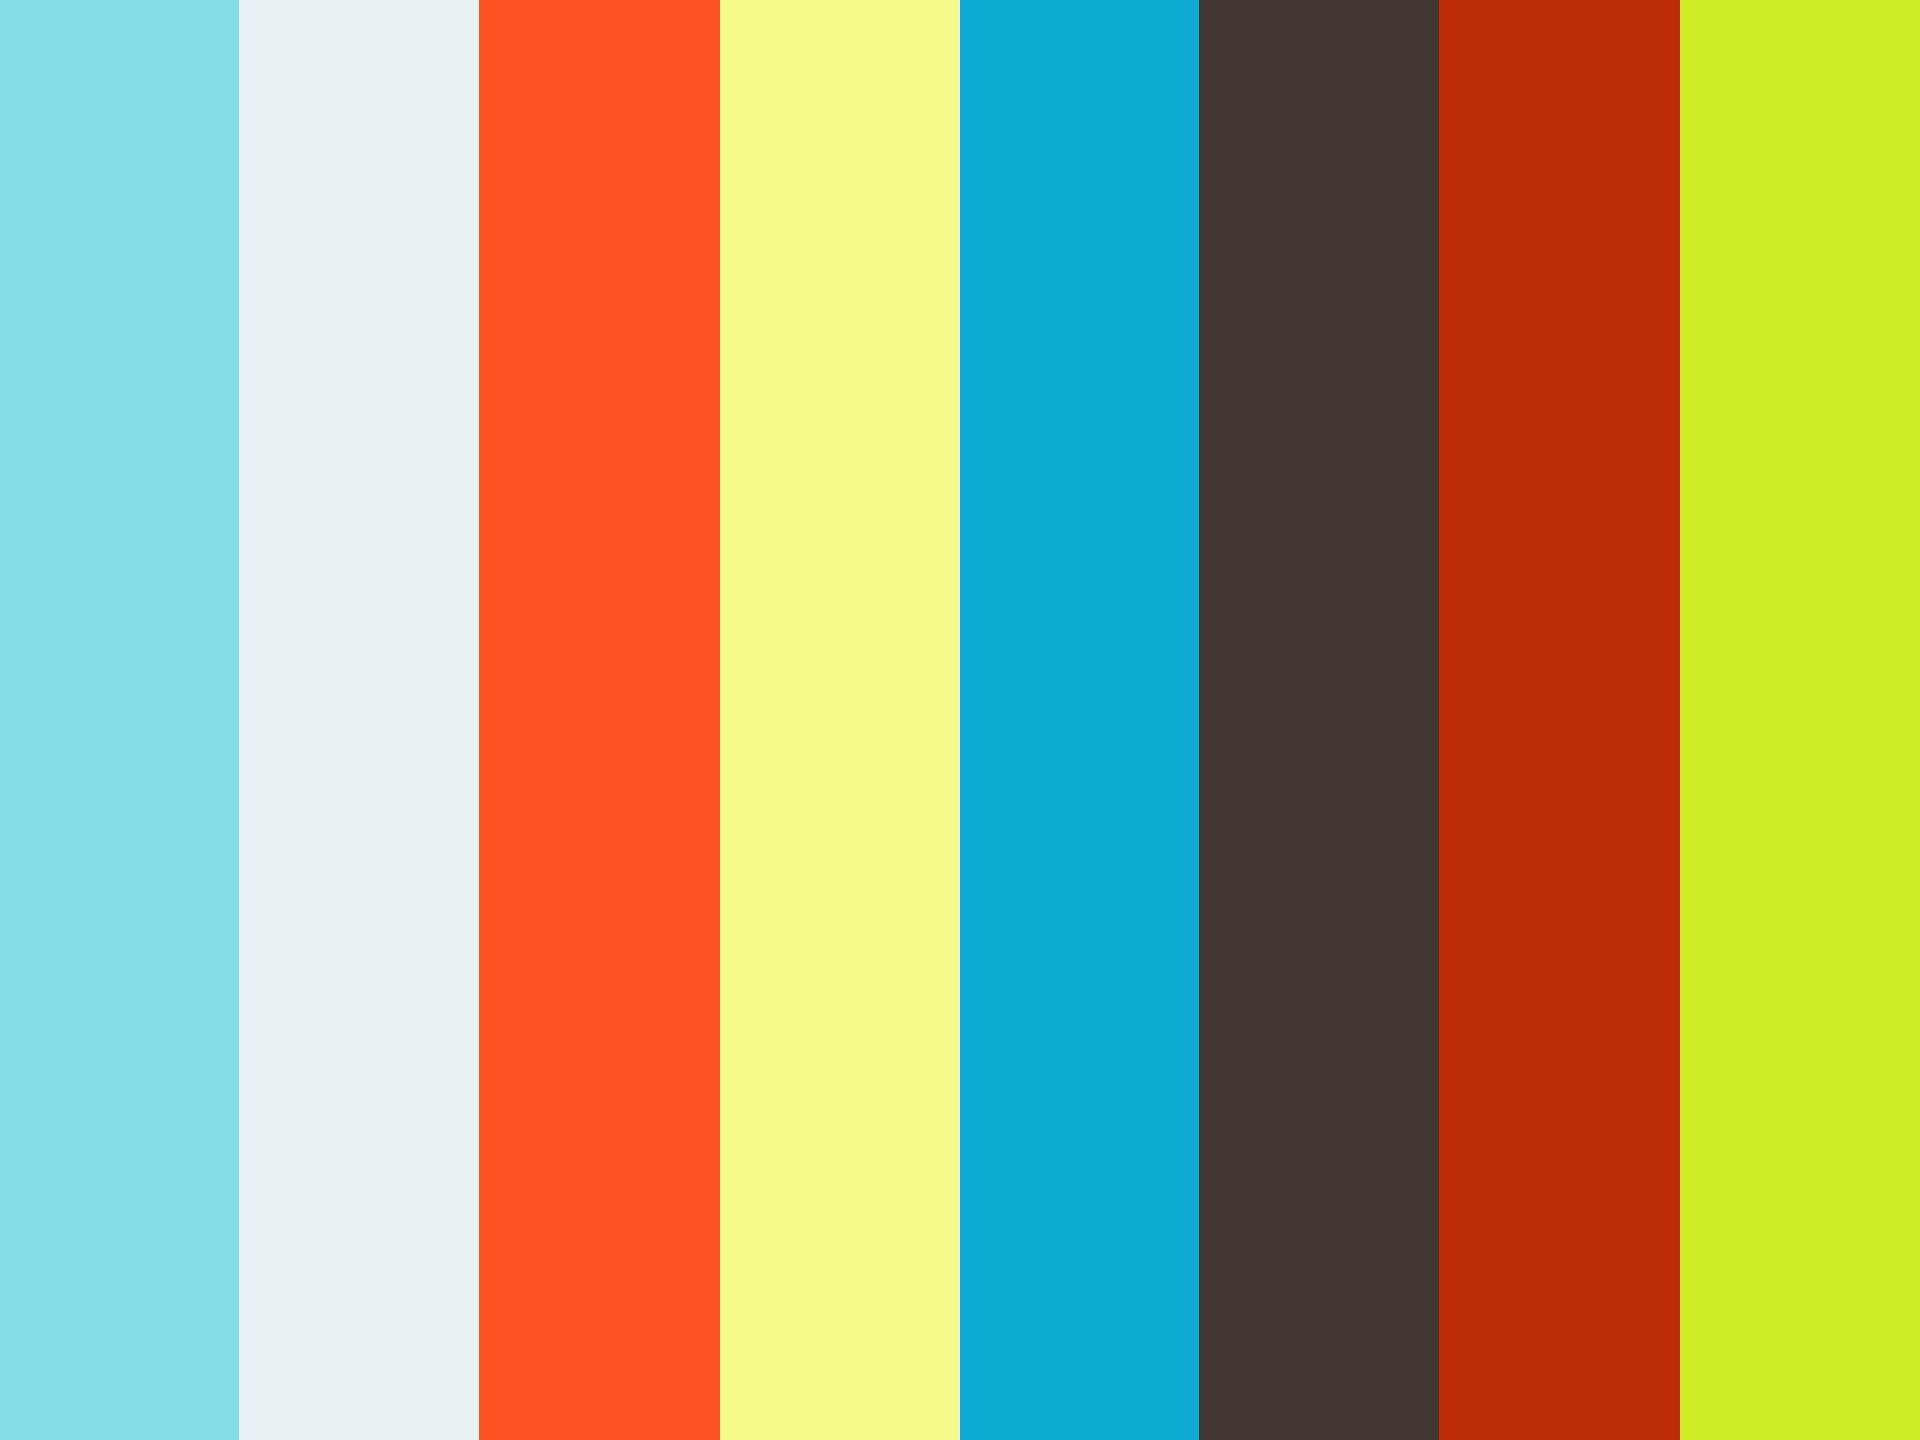 malayalam homoseksuelle videoer